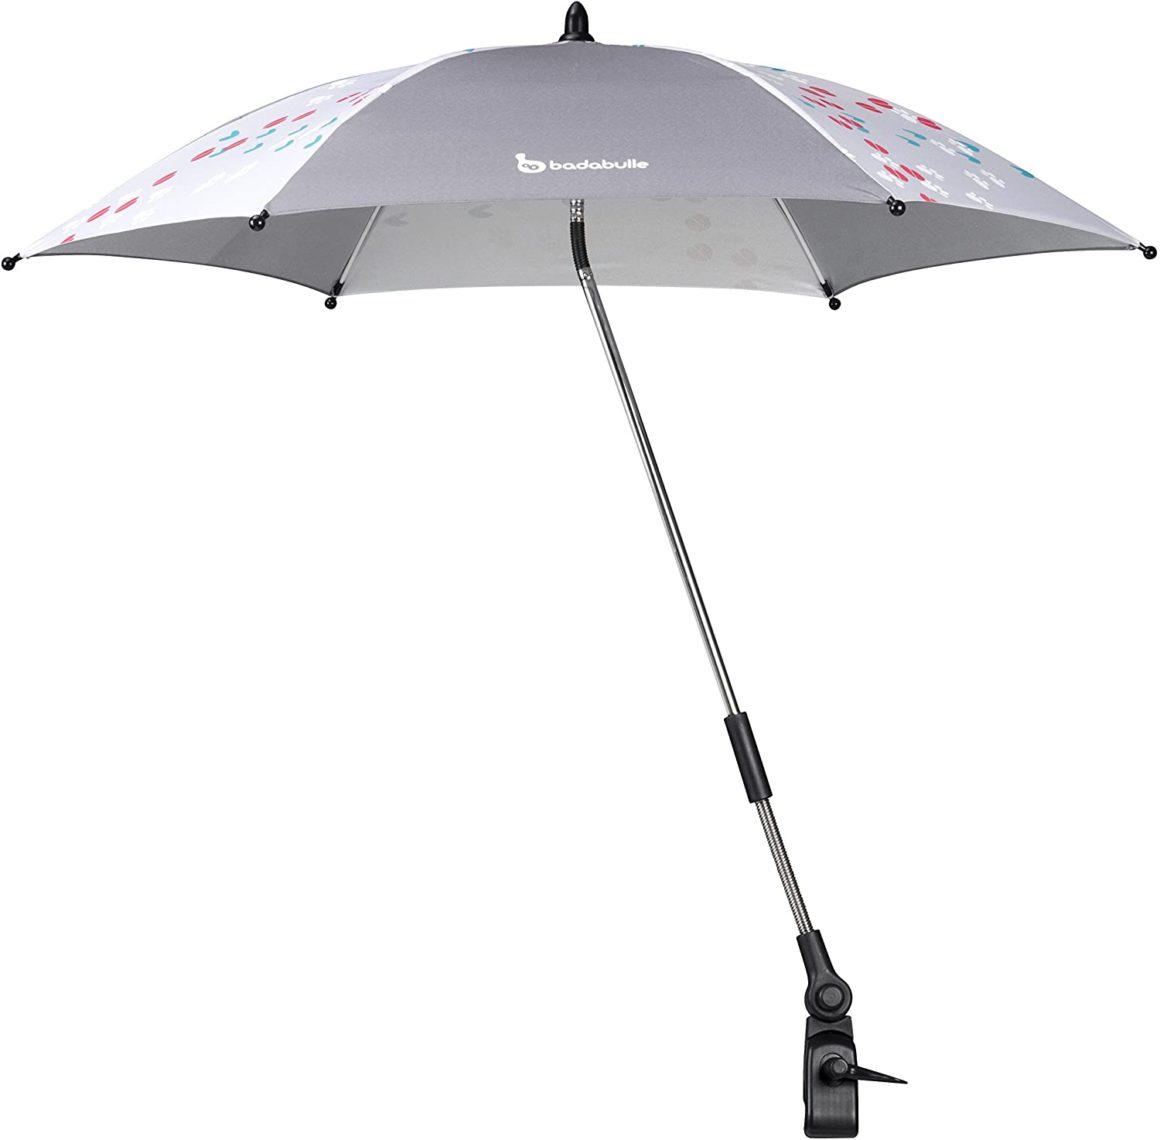 Badabulle ombrellone passeggino anti UV